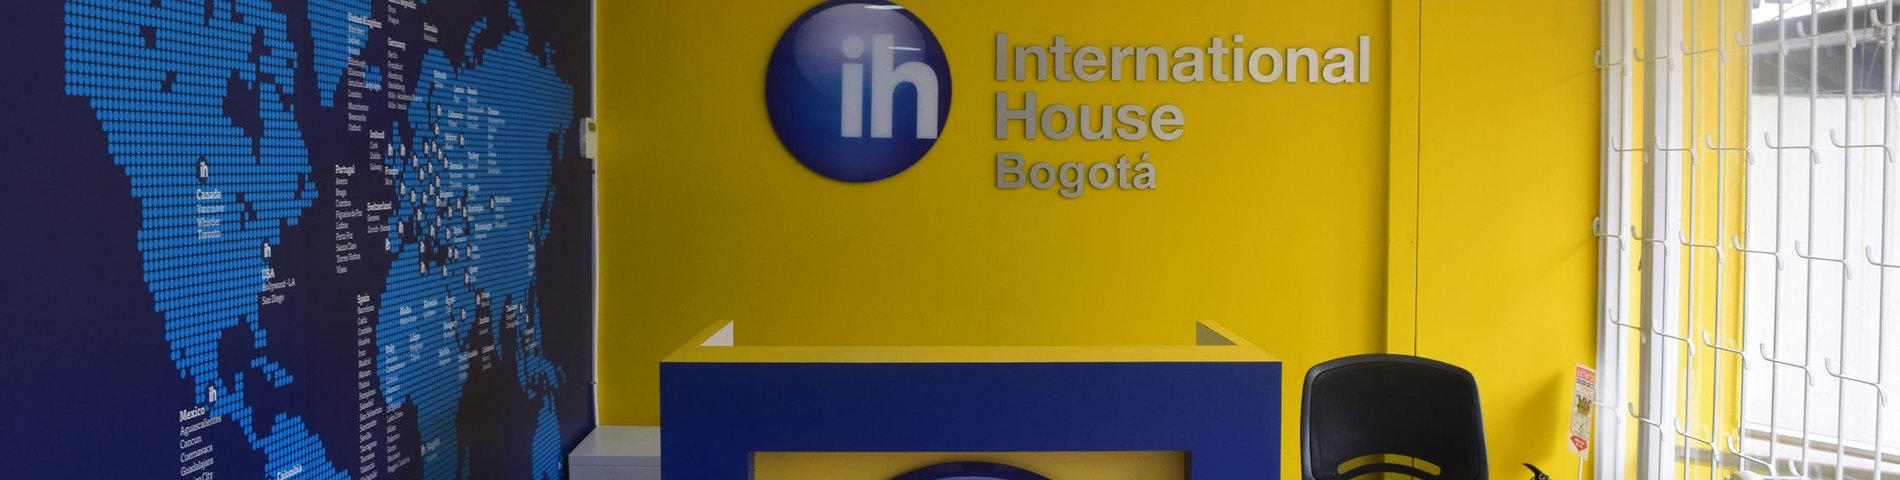 International House Bogota picture 1